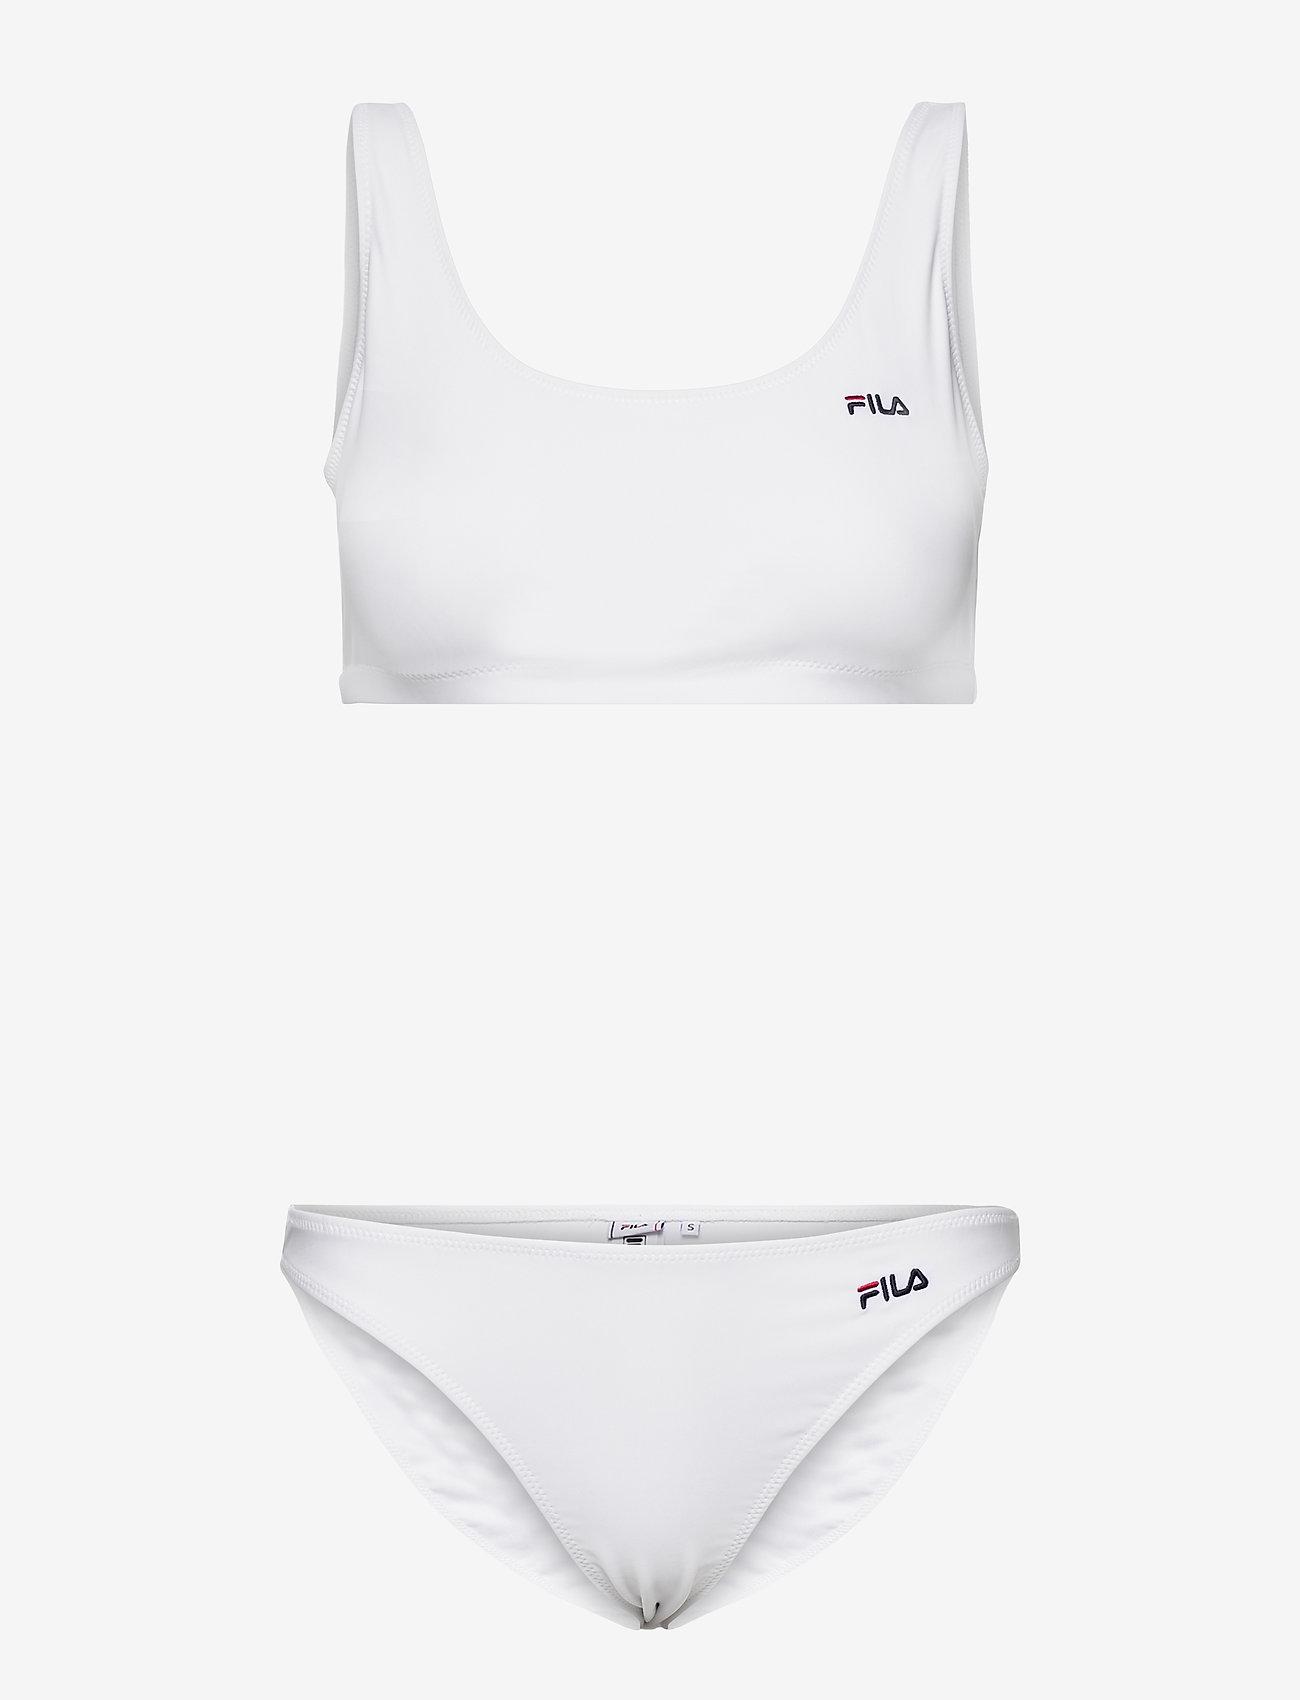 FILA - WOMEN SOFIA bikini / tango panty - bikini - bright white - 0